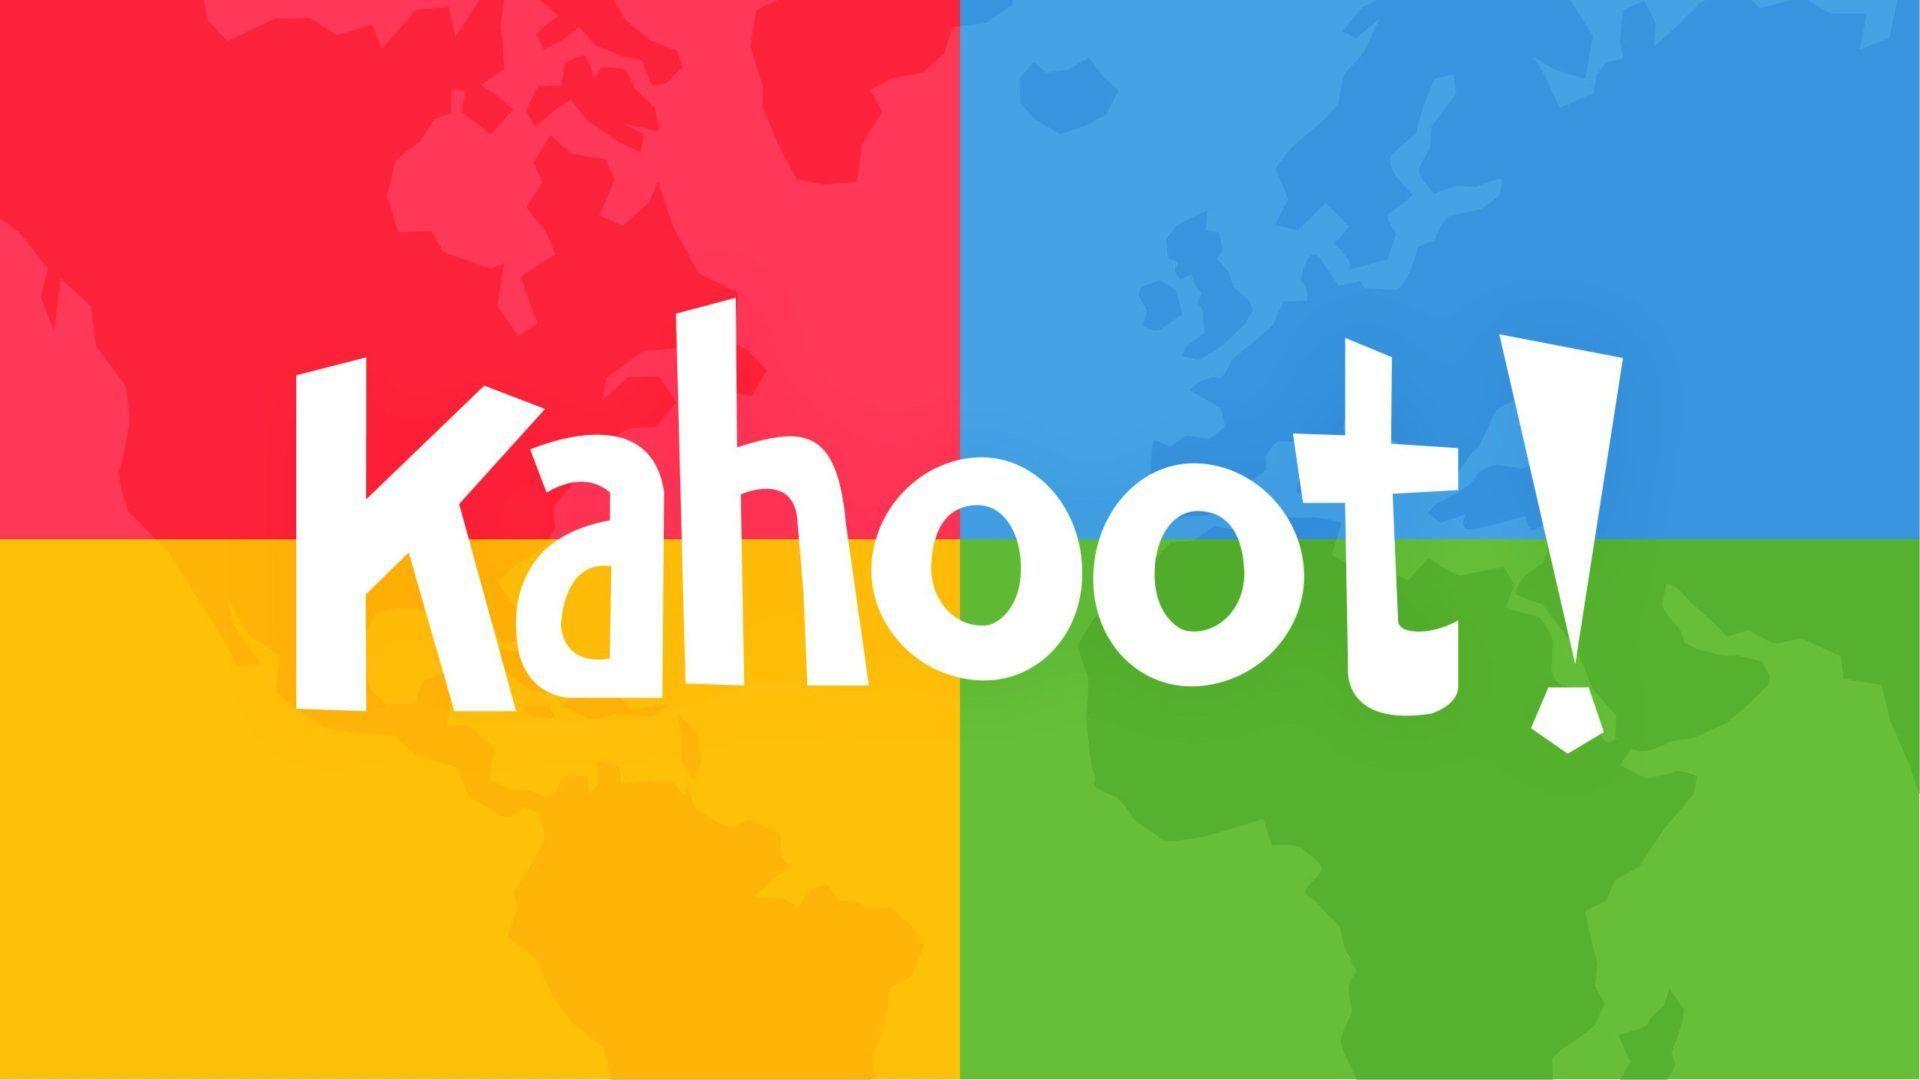 Kahoot! Premium gratis por coronavirus